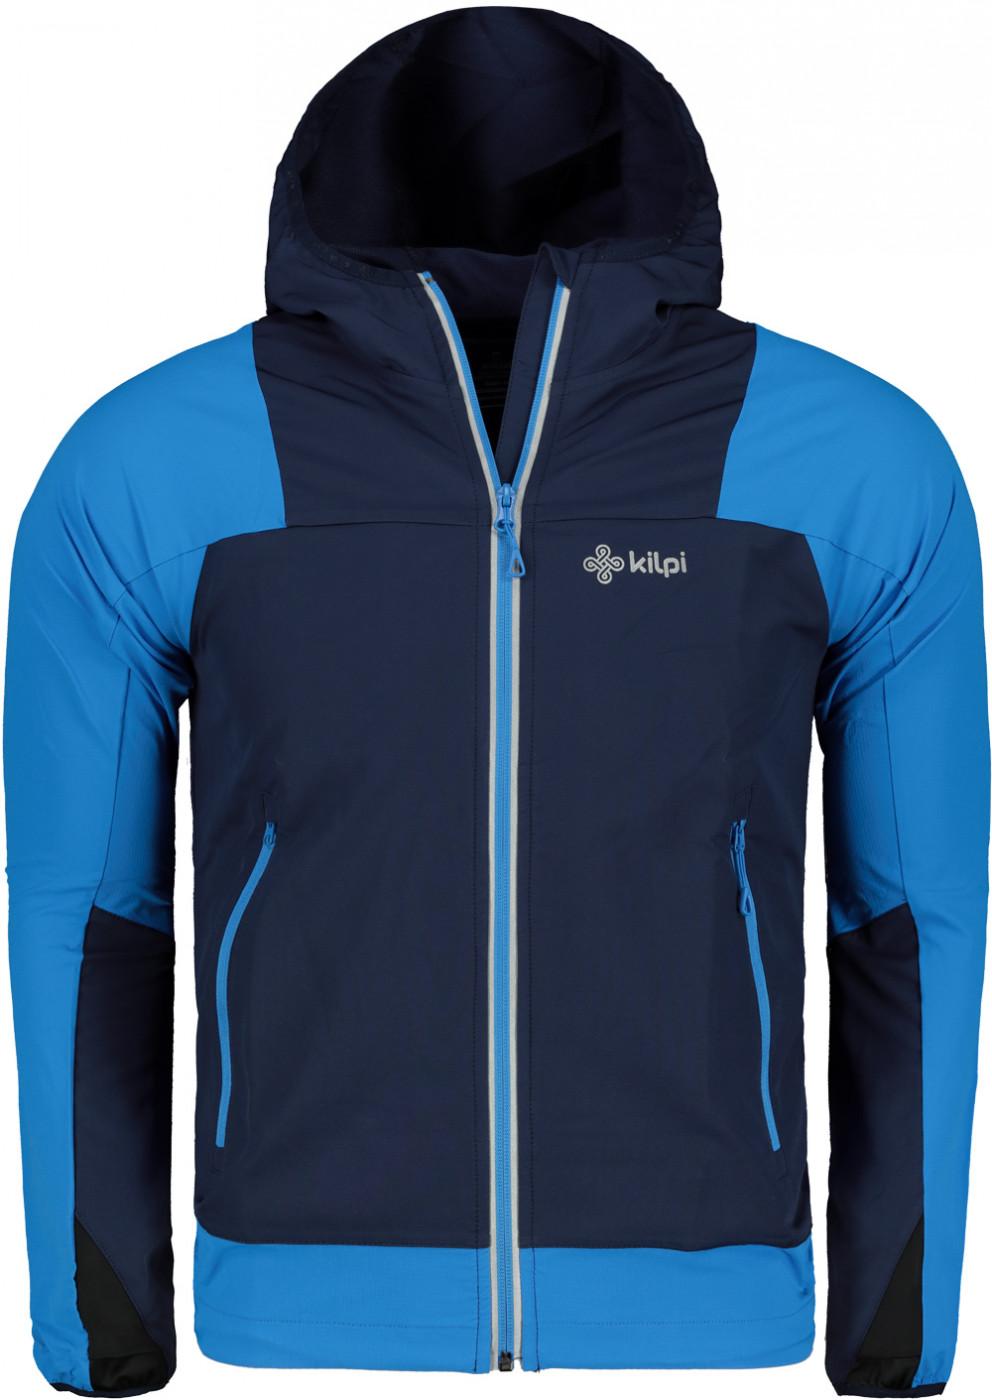 Men's jacket Kilpi JOSHUA-M